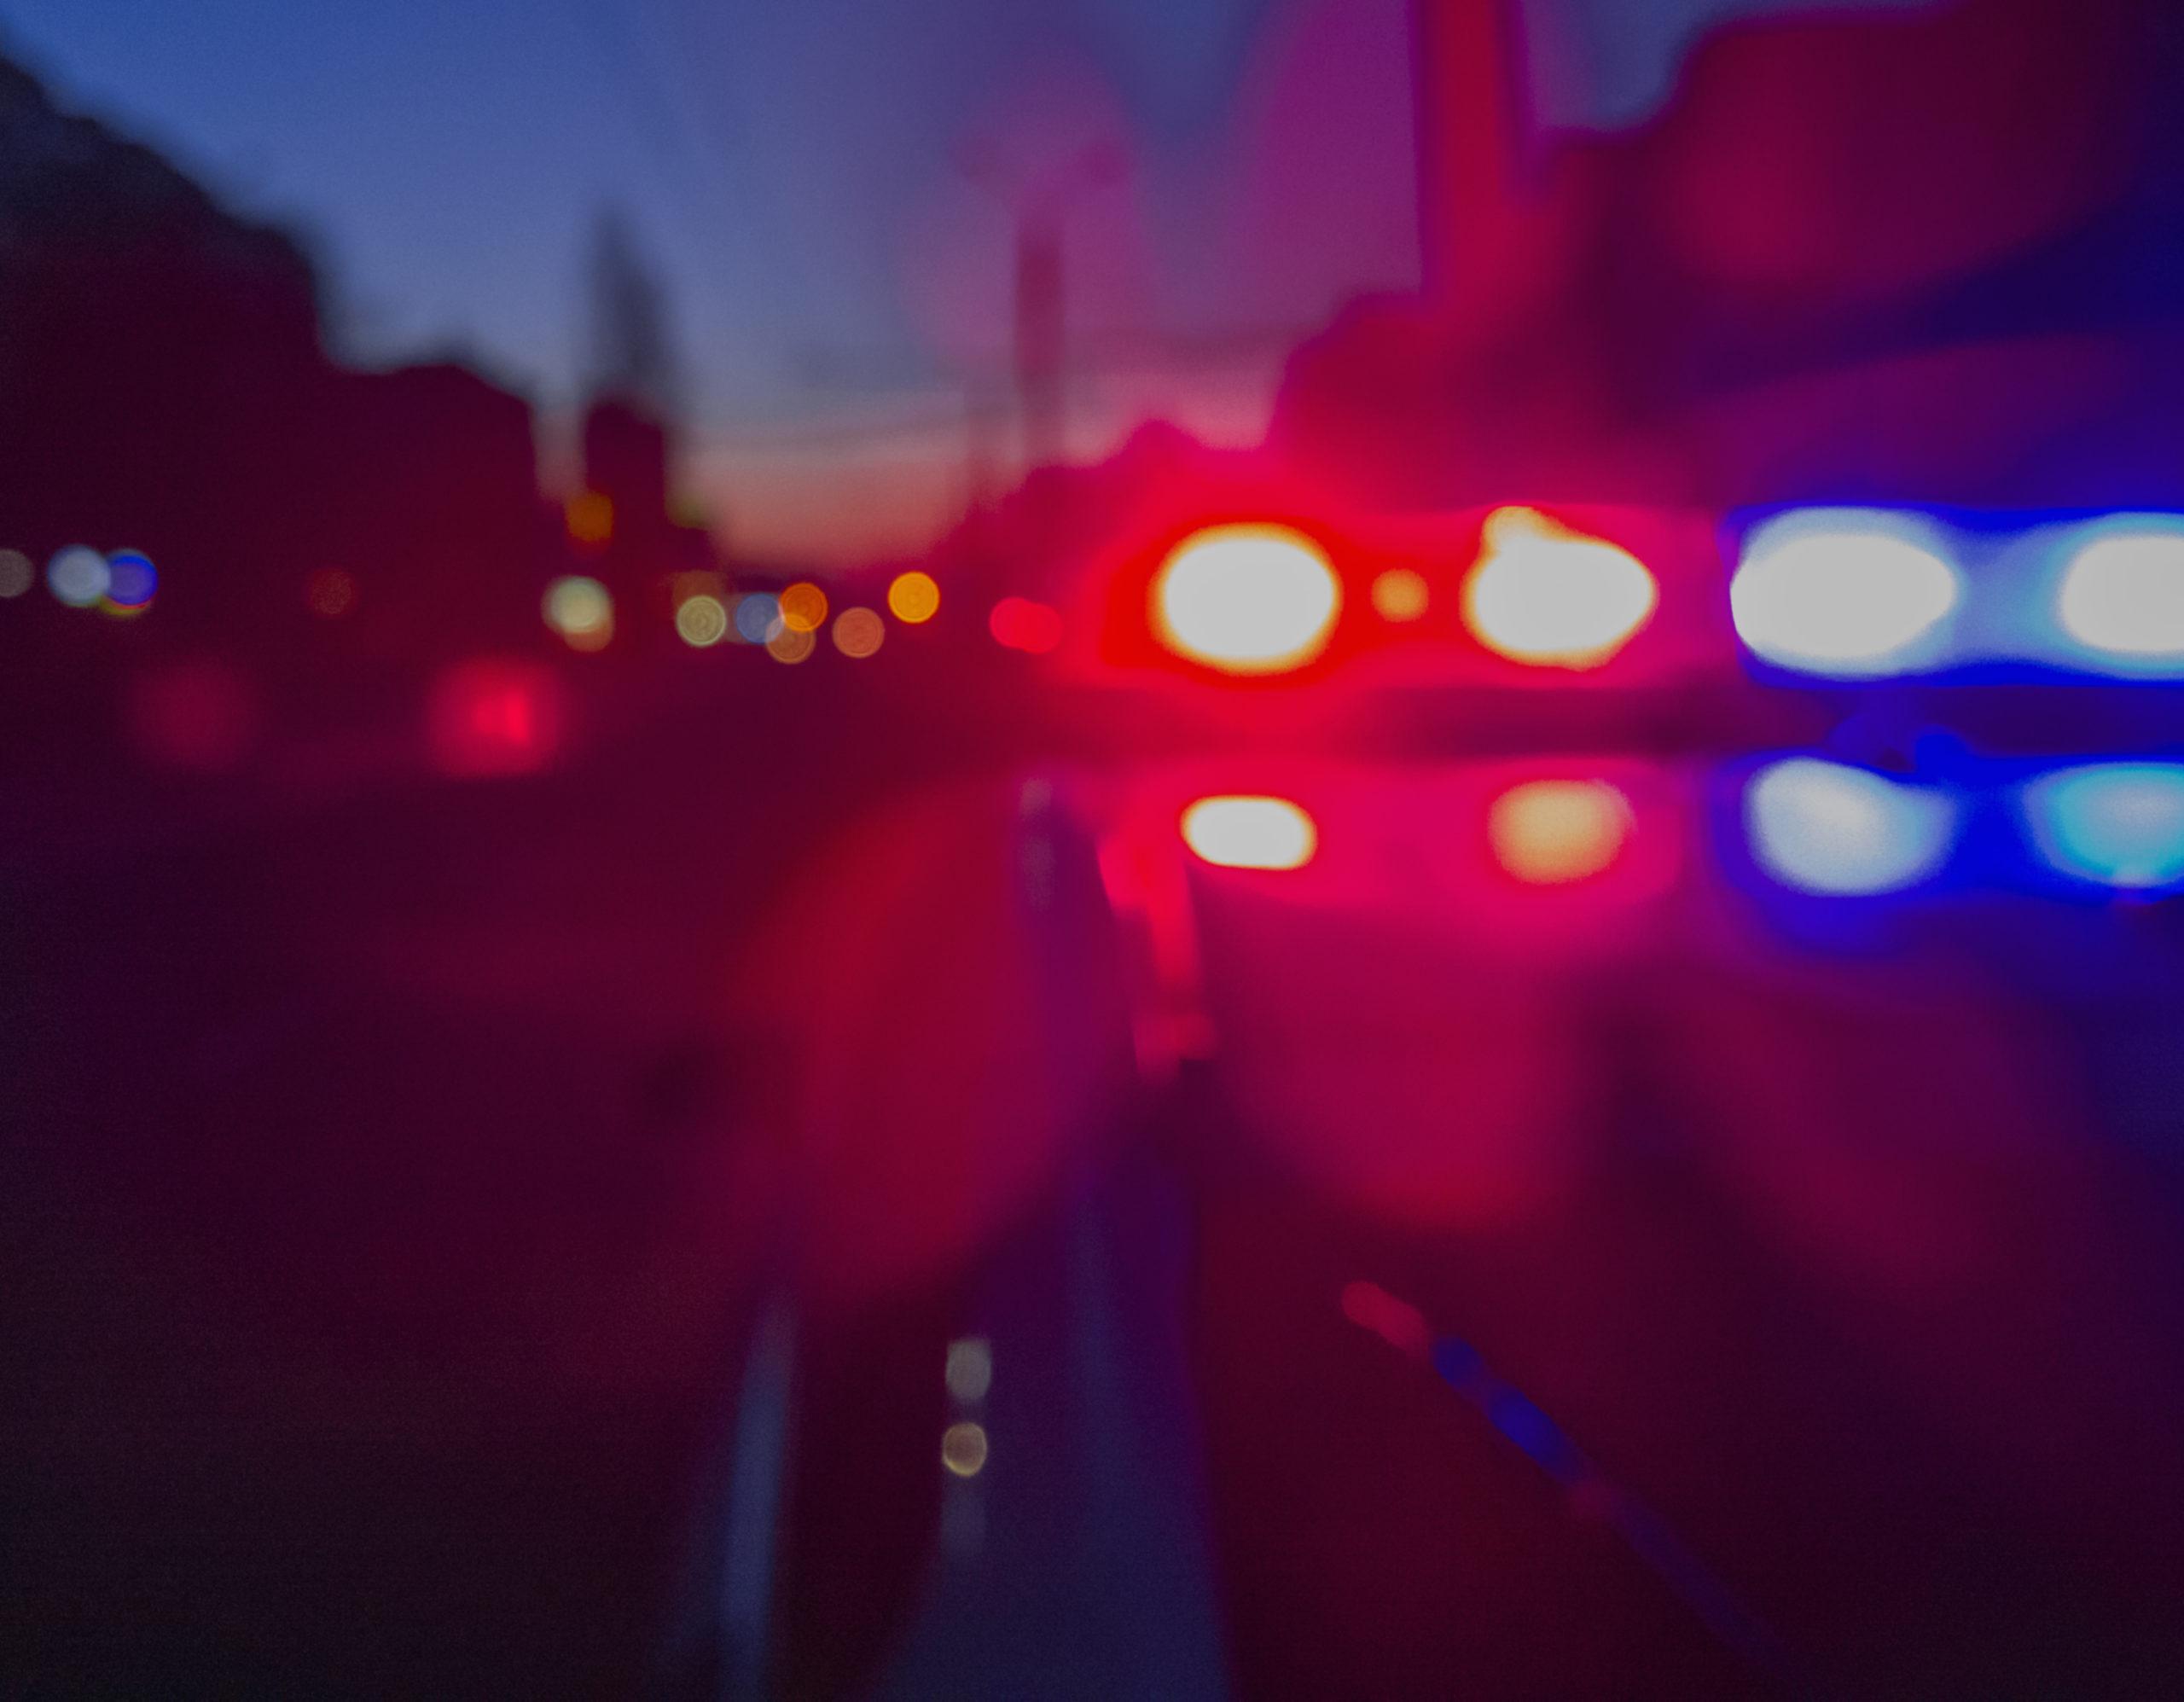 Red and blue police lights. [Yevhen Prozhyrko/Shutterstock]